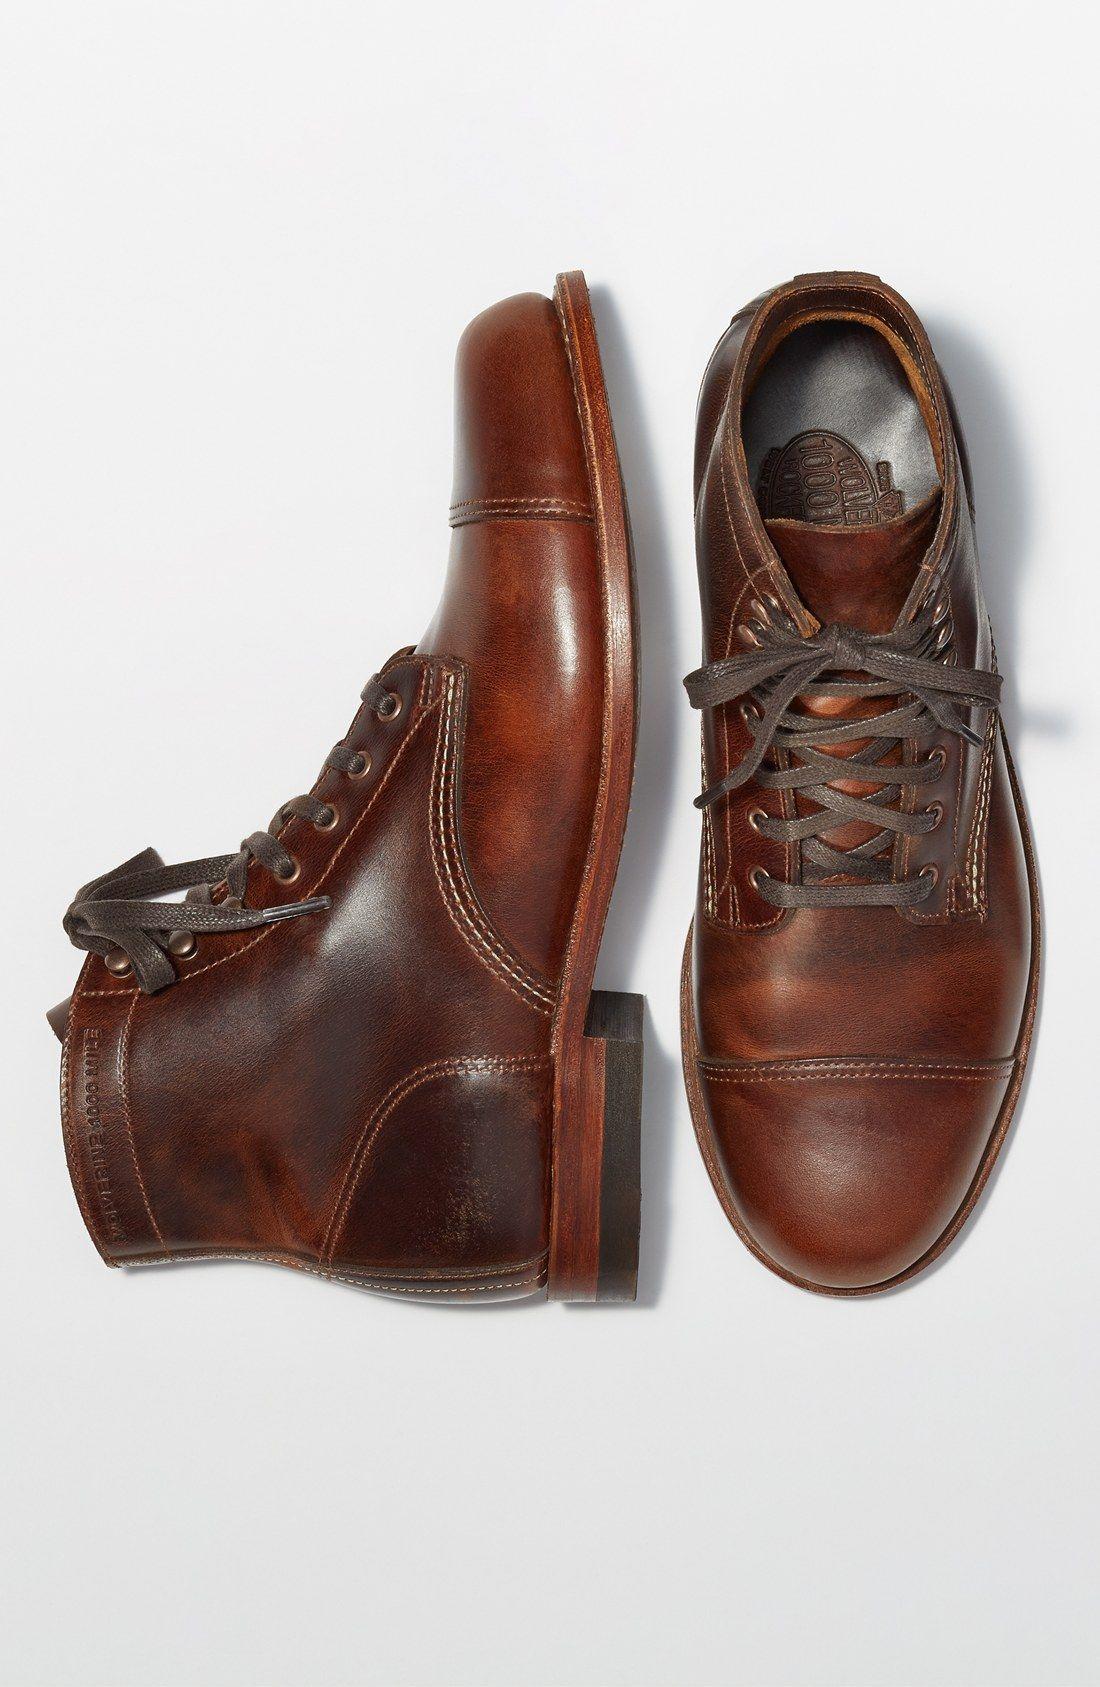 31c435bcd8b Wolverine '1000 Mile - McClean' Leather Cap Toe Boot | men's fashion ...